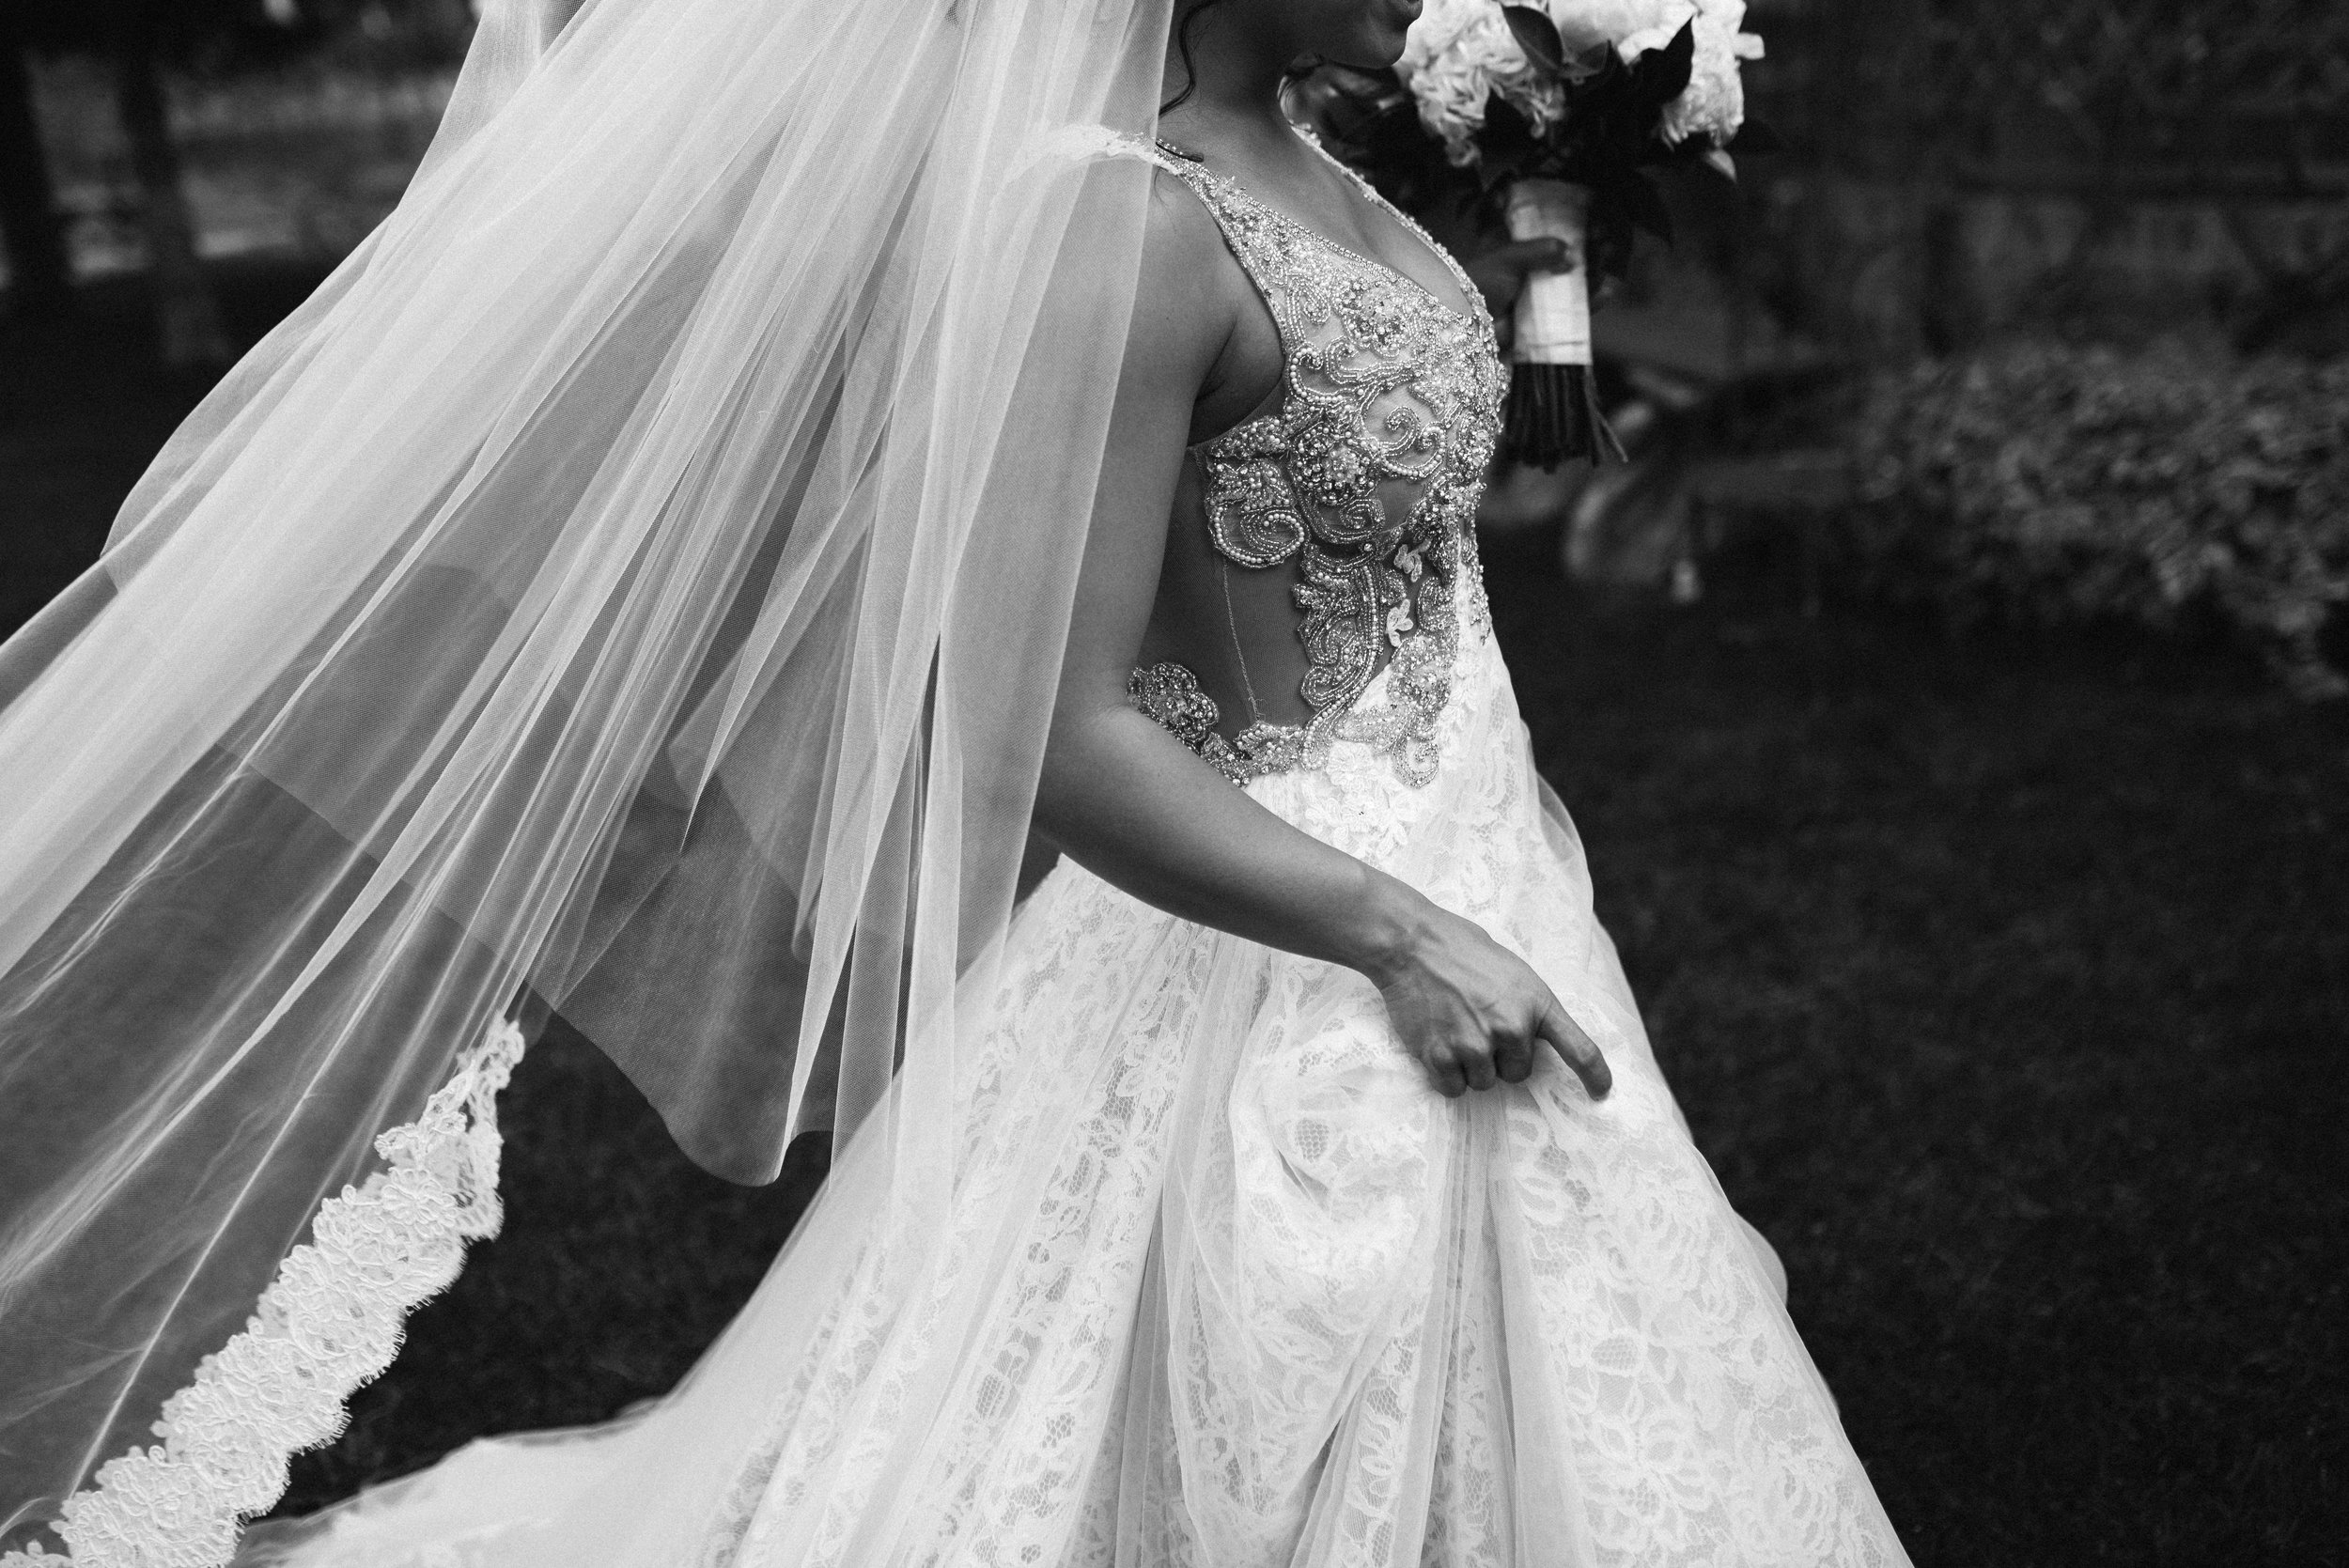 weddingsneak-edenstraderphoto-19.jpg